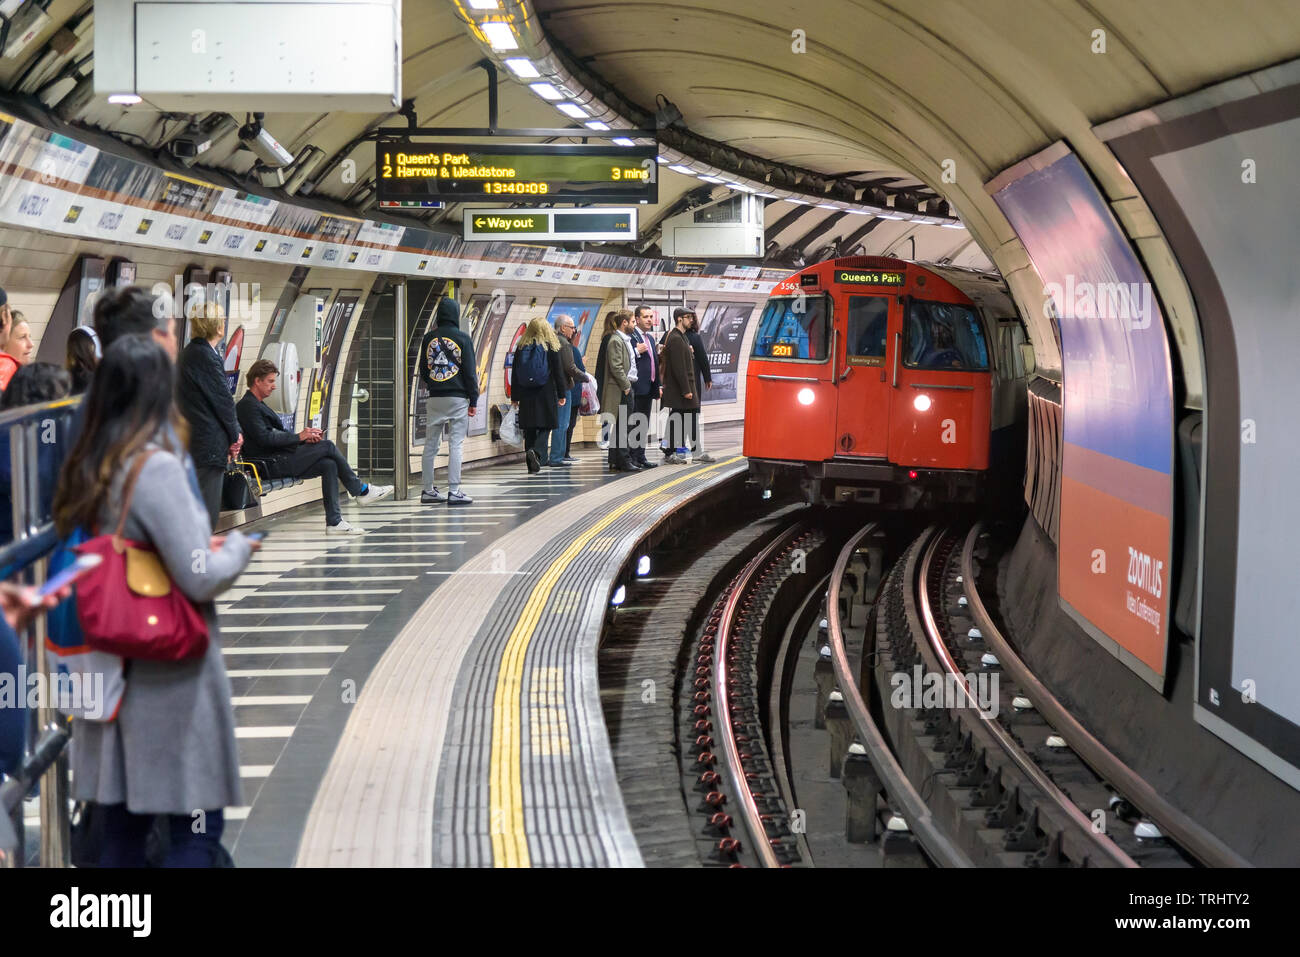 London, UK - May 1, 2018: Train approaching the Waterloo underground station - Stock Image